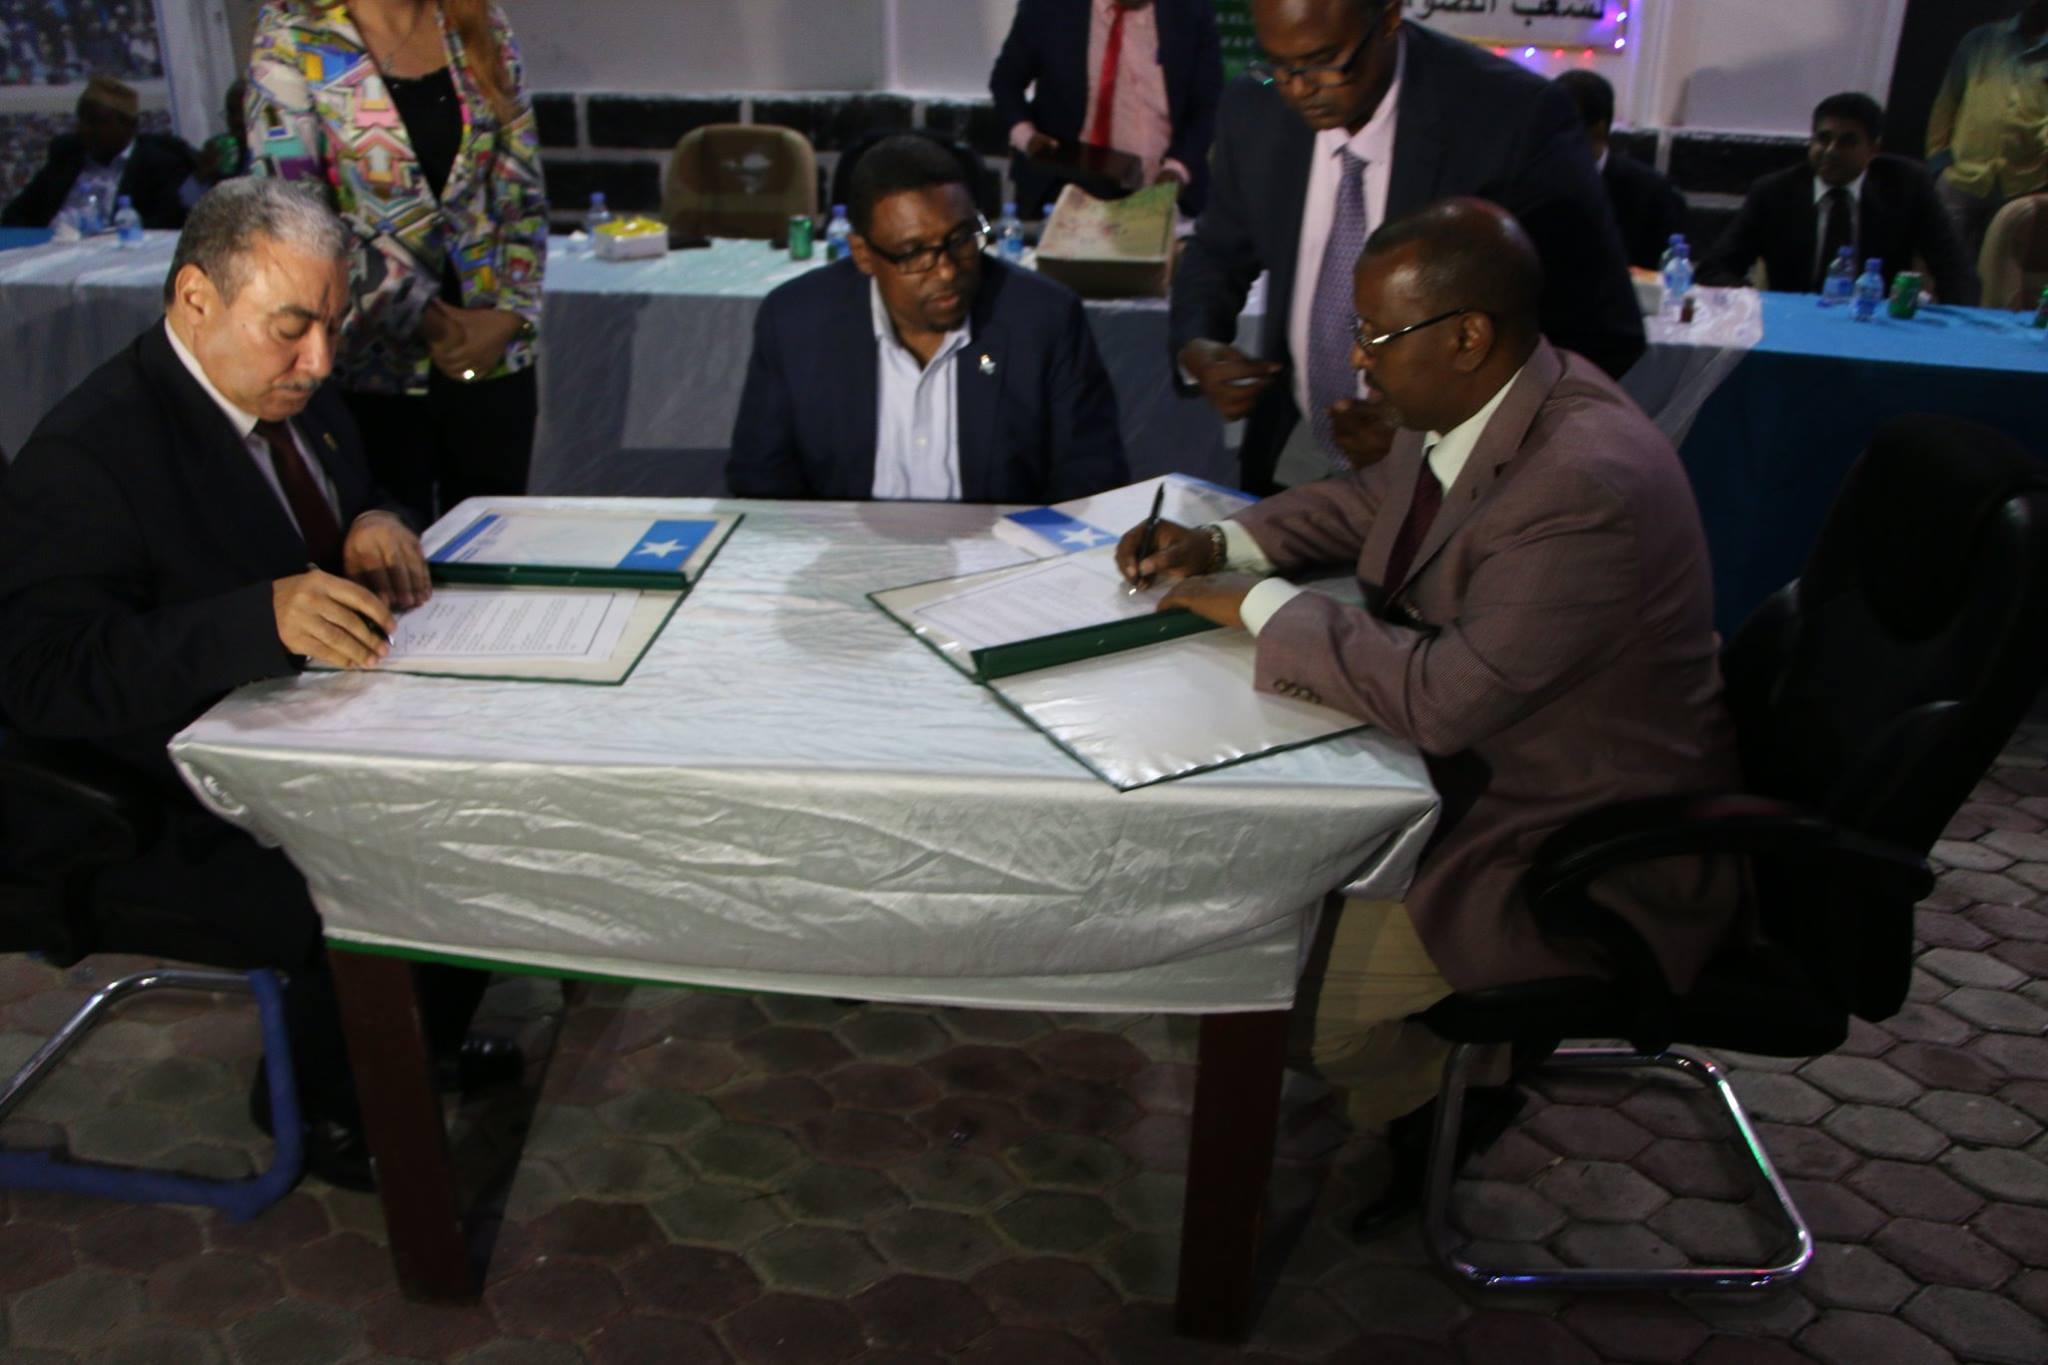 somalia chamber of commerce Egyption Chamber of Commerce sign MOU with Somali Chamber of Commerce